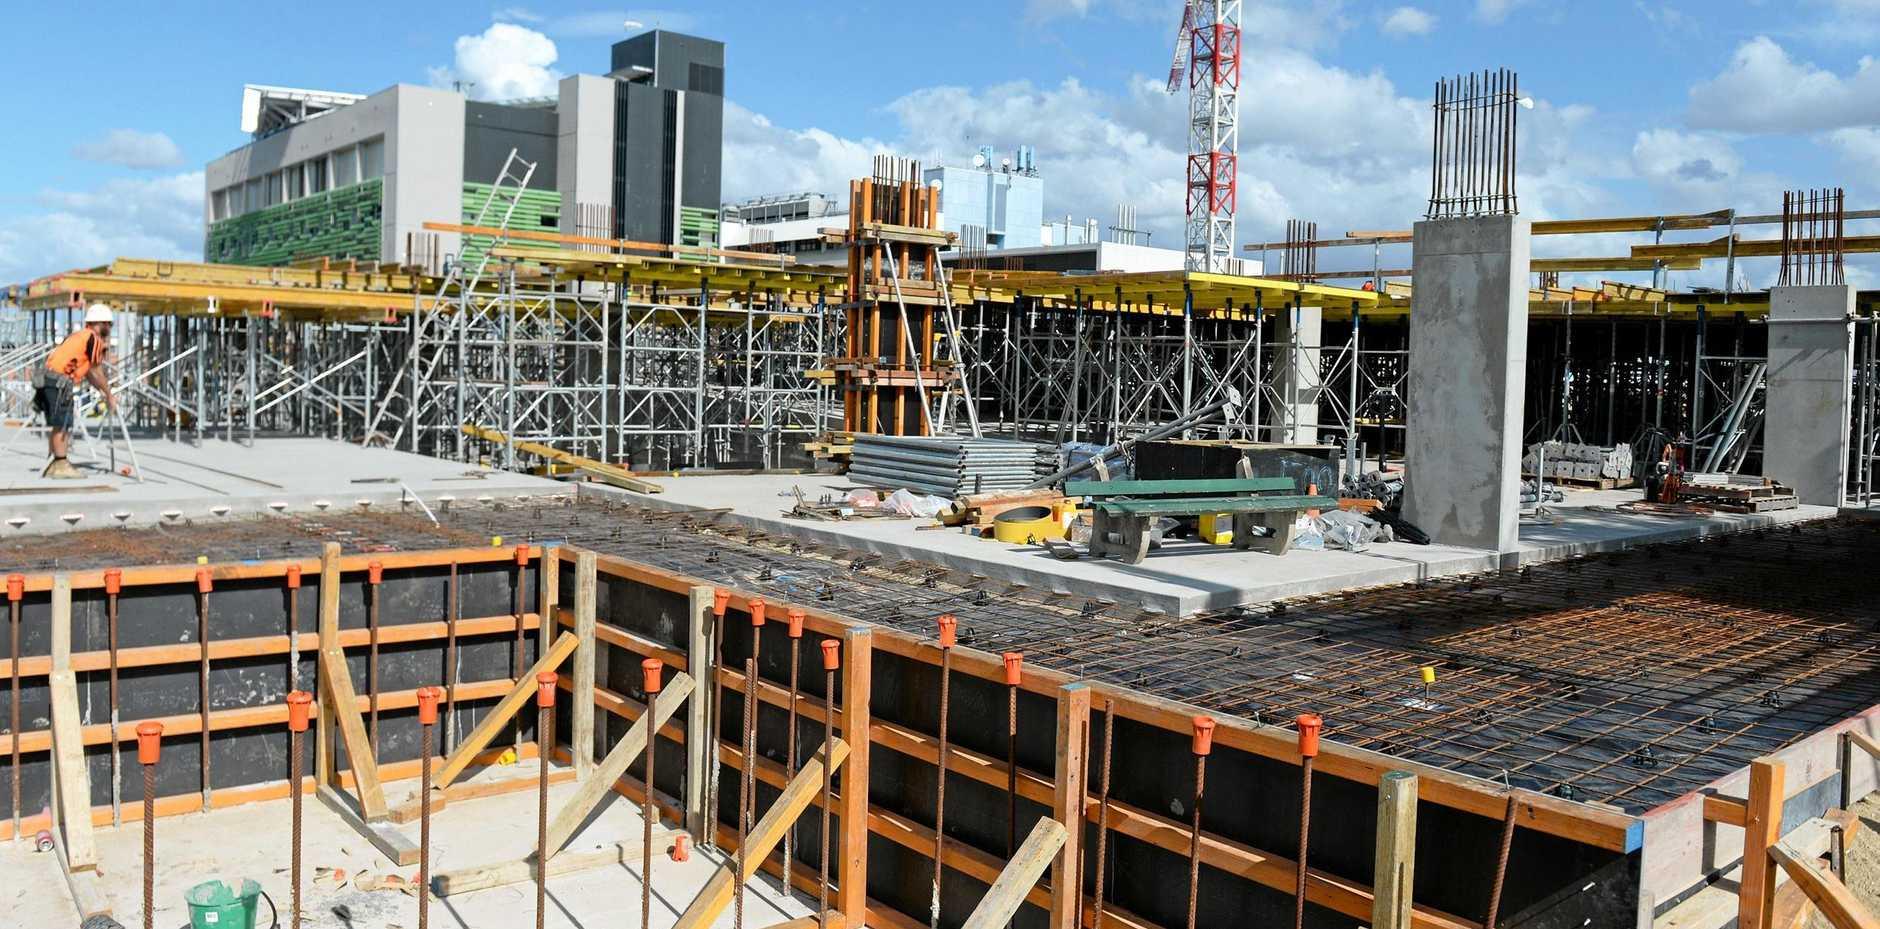 Rockhampton Hospital Carpark under construction.